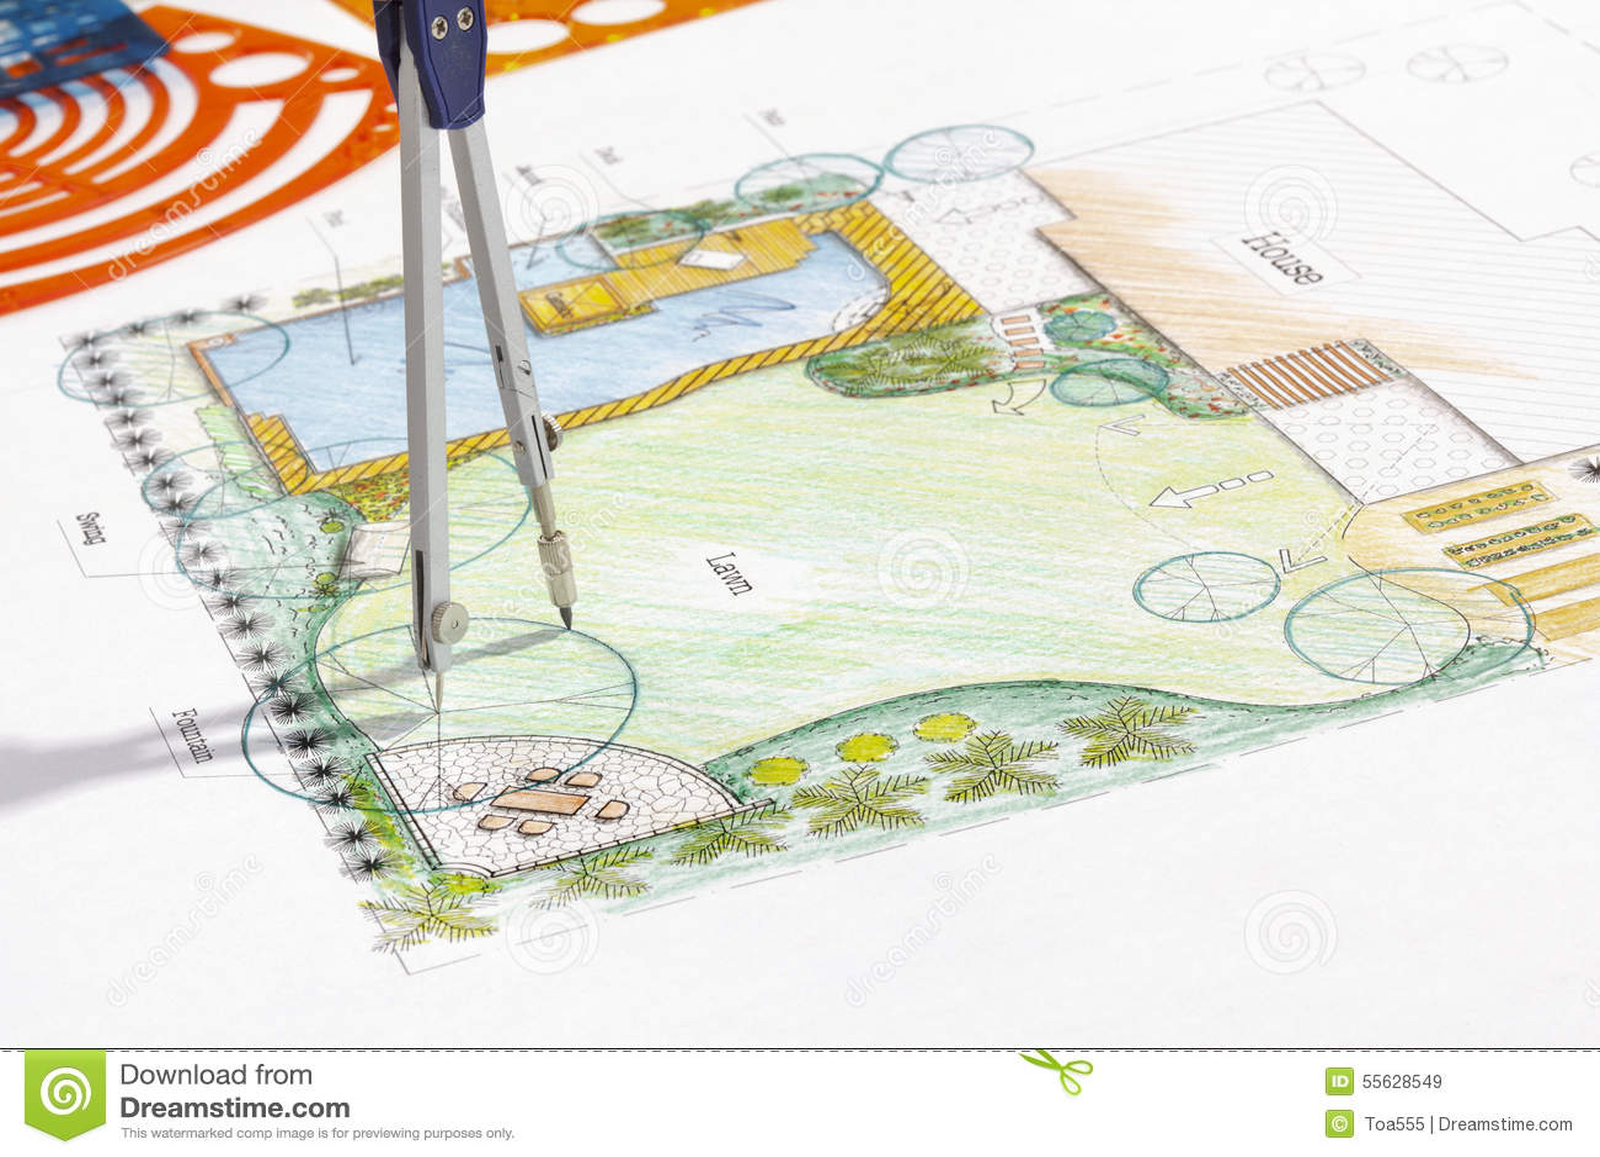 Backyard Garden Design Plan. Stock Image - Image of ornamental ...